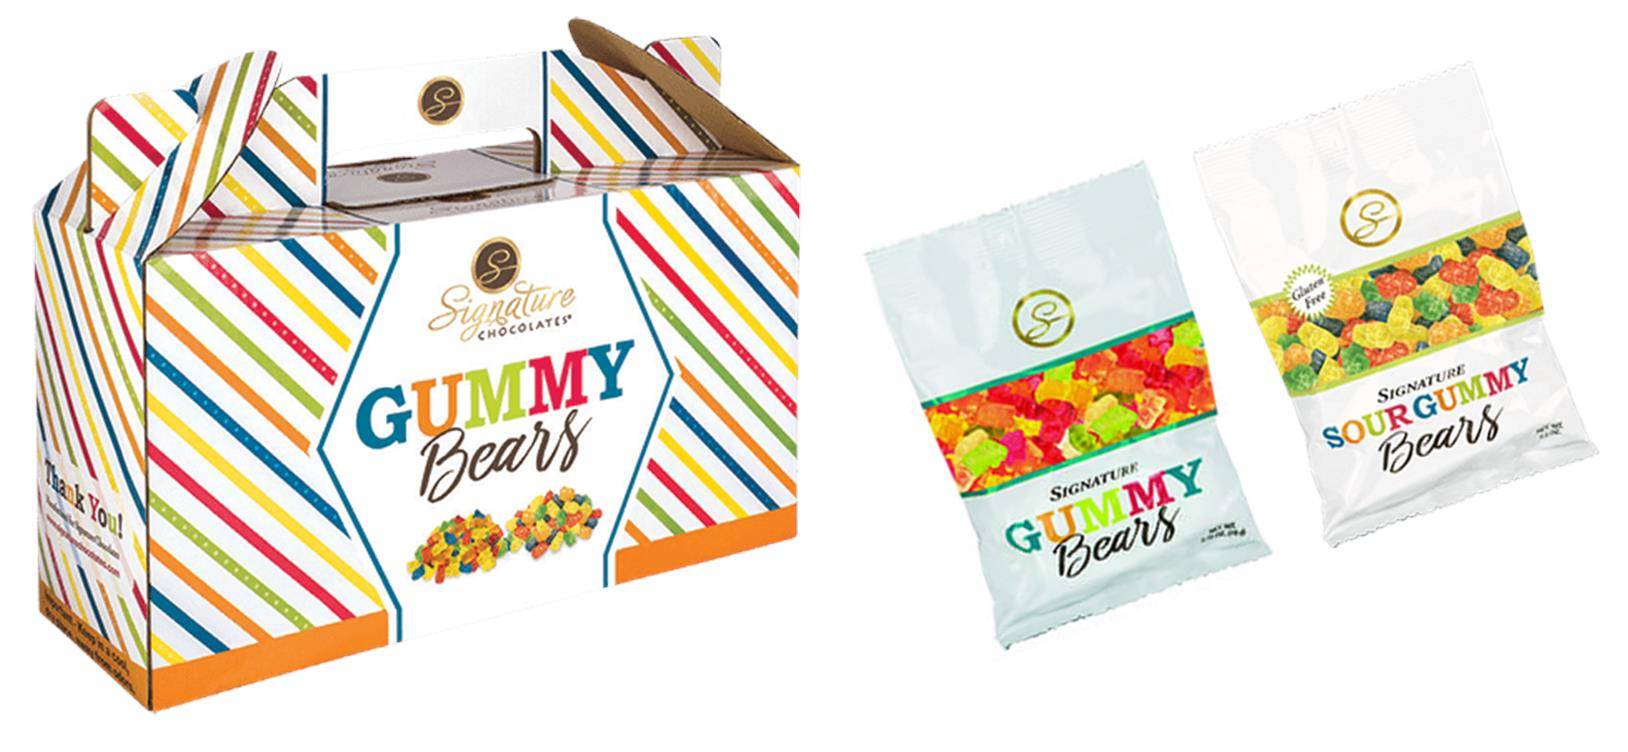 Signature Gummy Bears Carrier & Bags